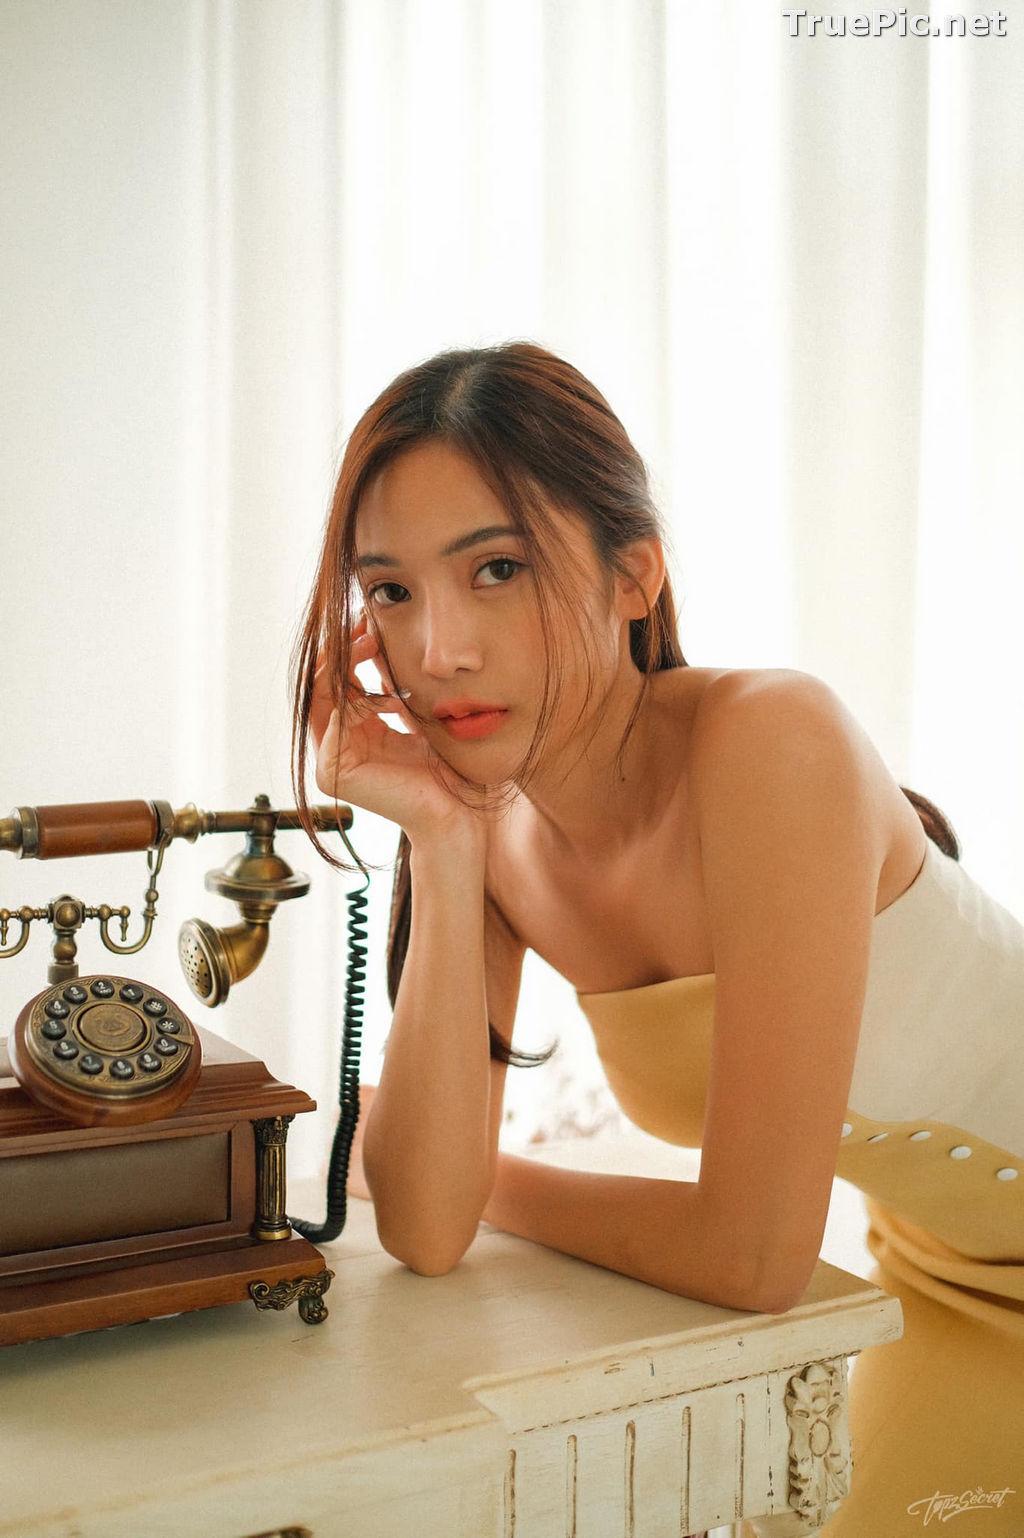 Image Thailand Model - Weeraya Sukaram - Concept Bodycon Dresses - TruePic.net - Picture-1